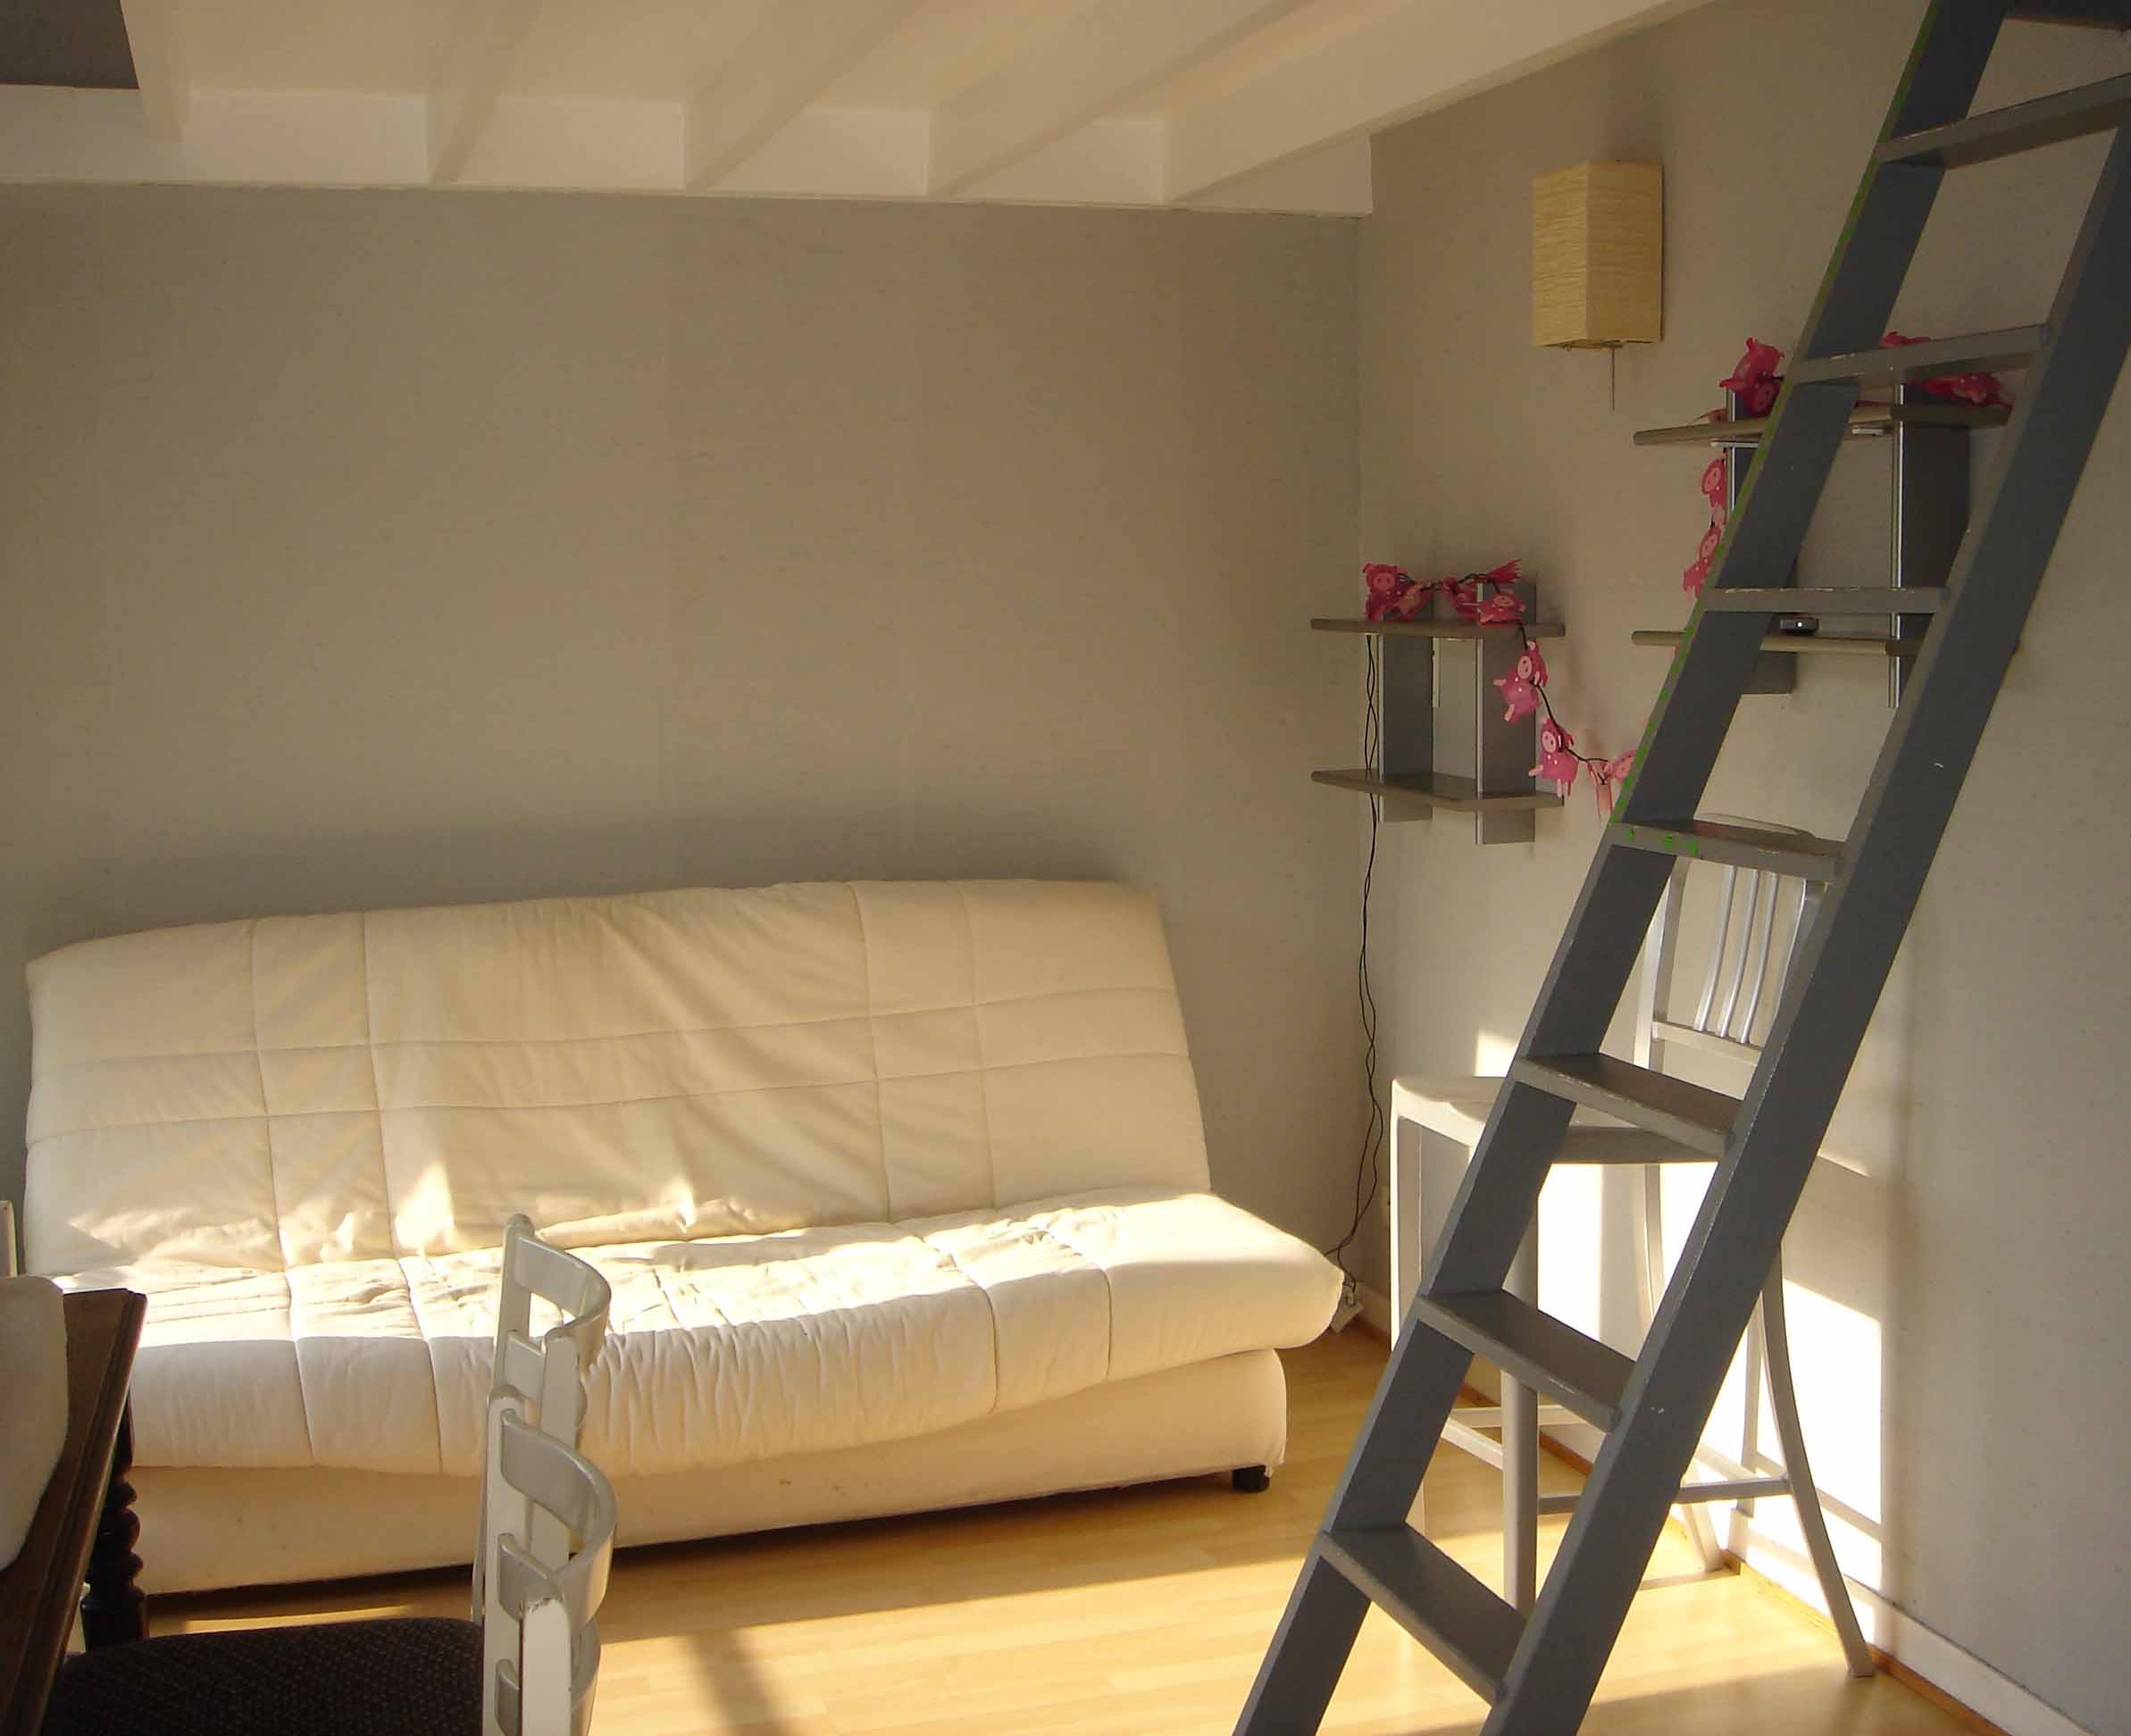 La salon séjour de l'Etoile de Mer à Dinard